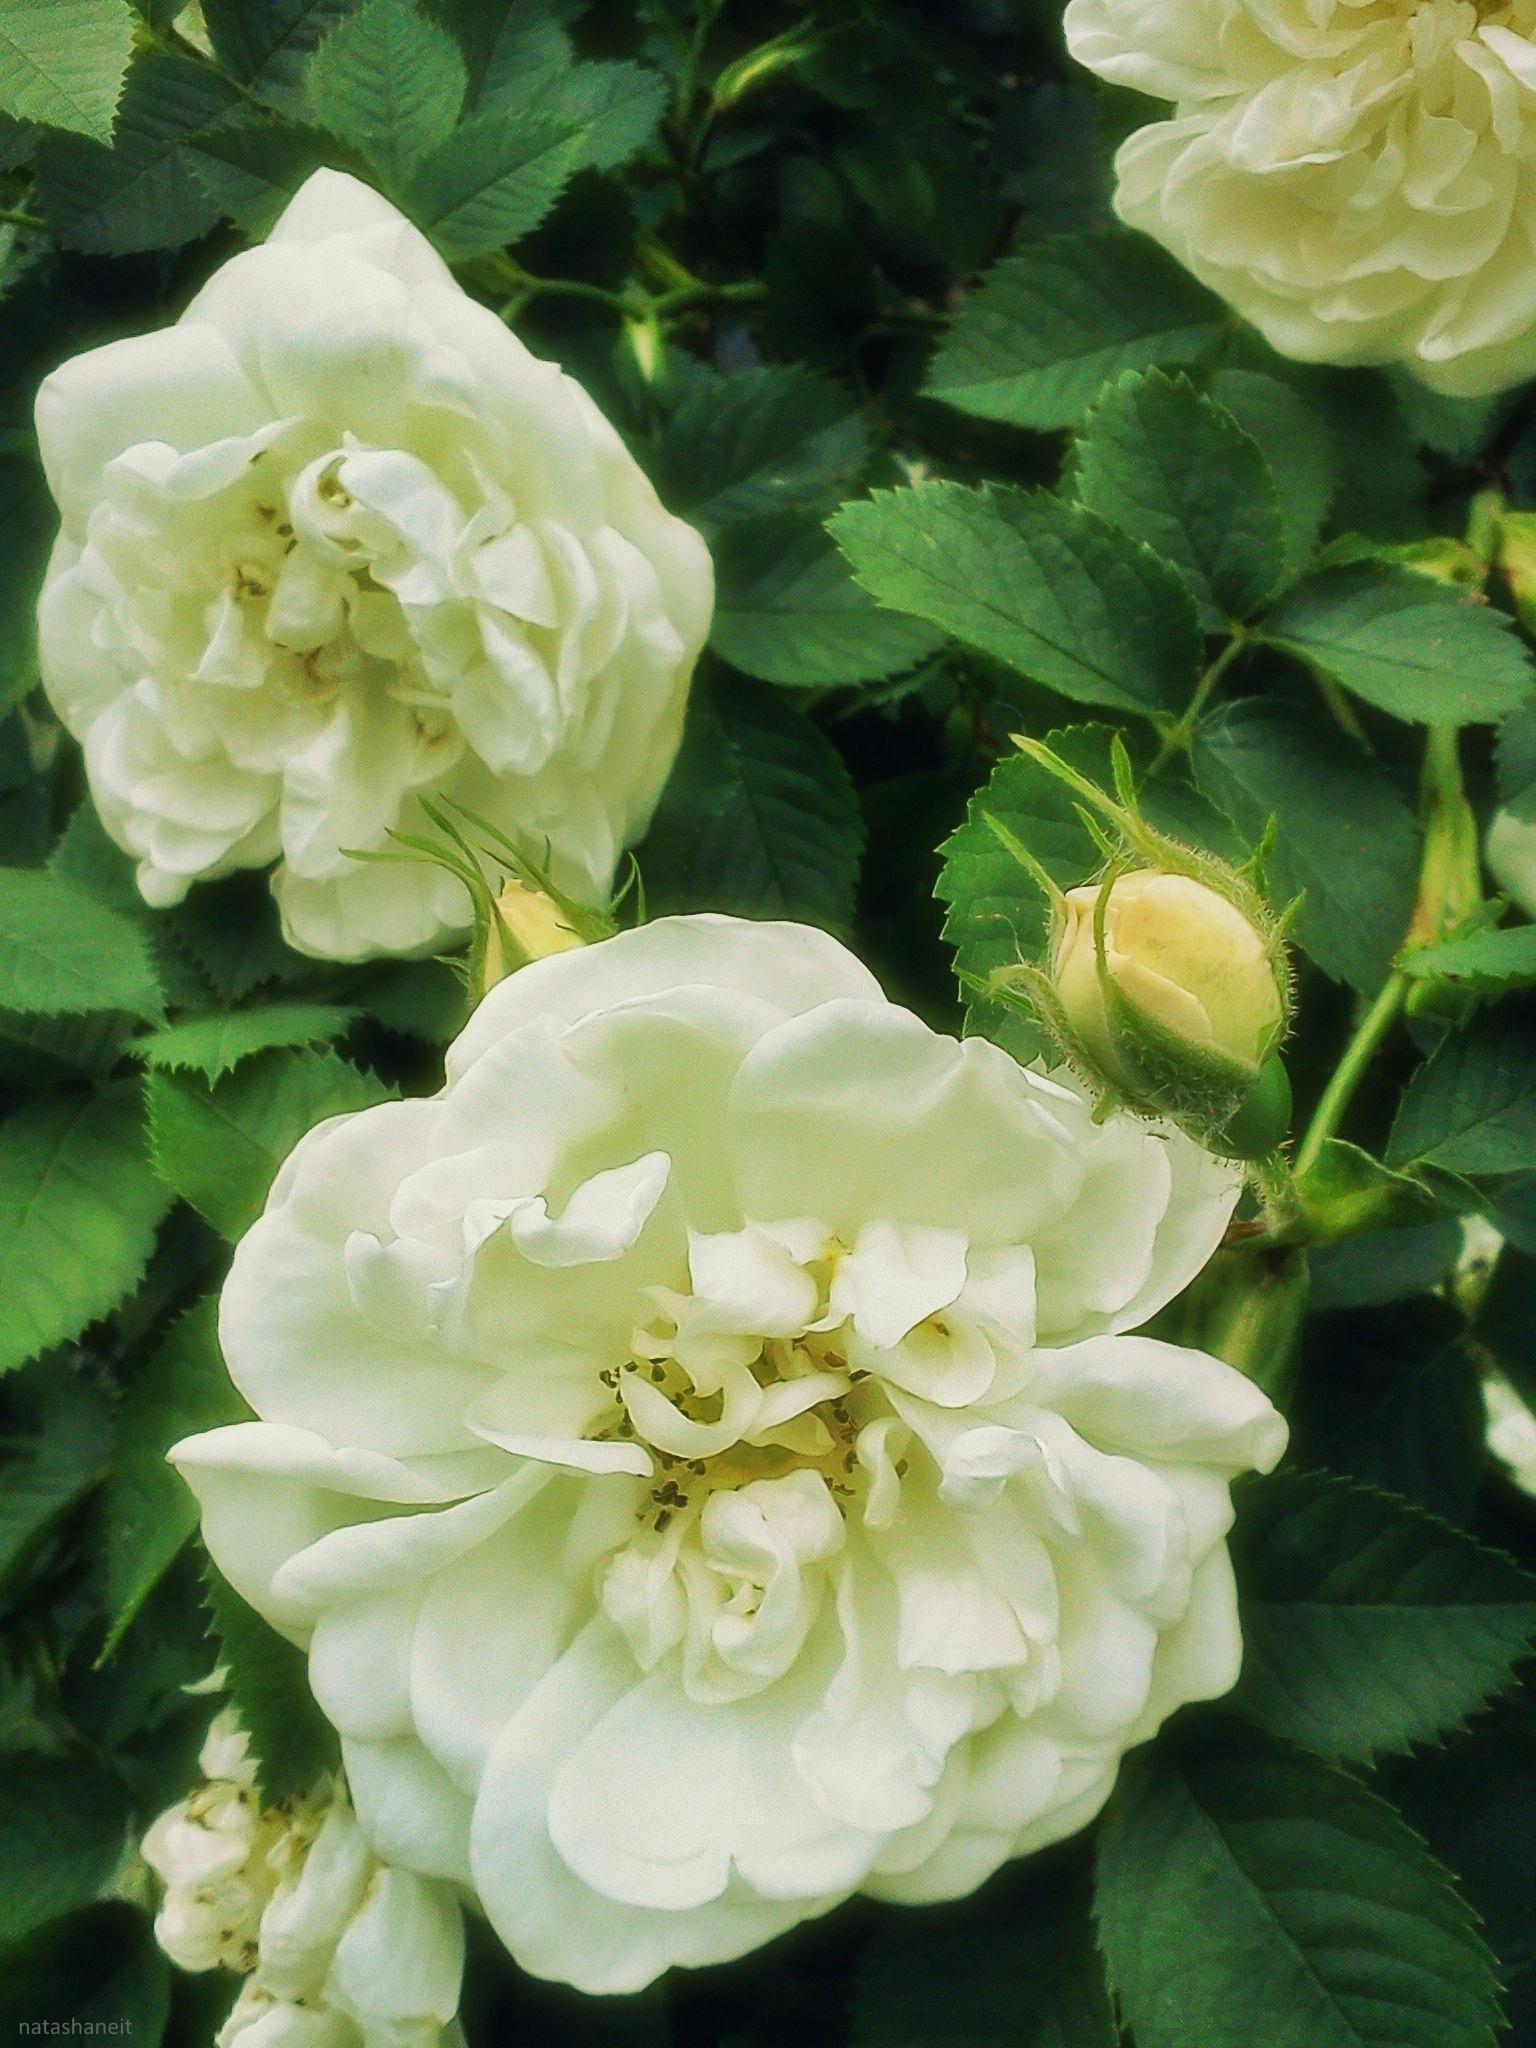 White rose by natashaneit